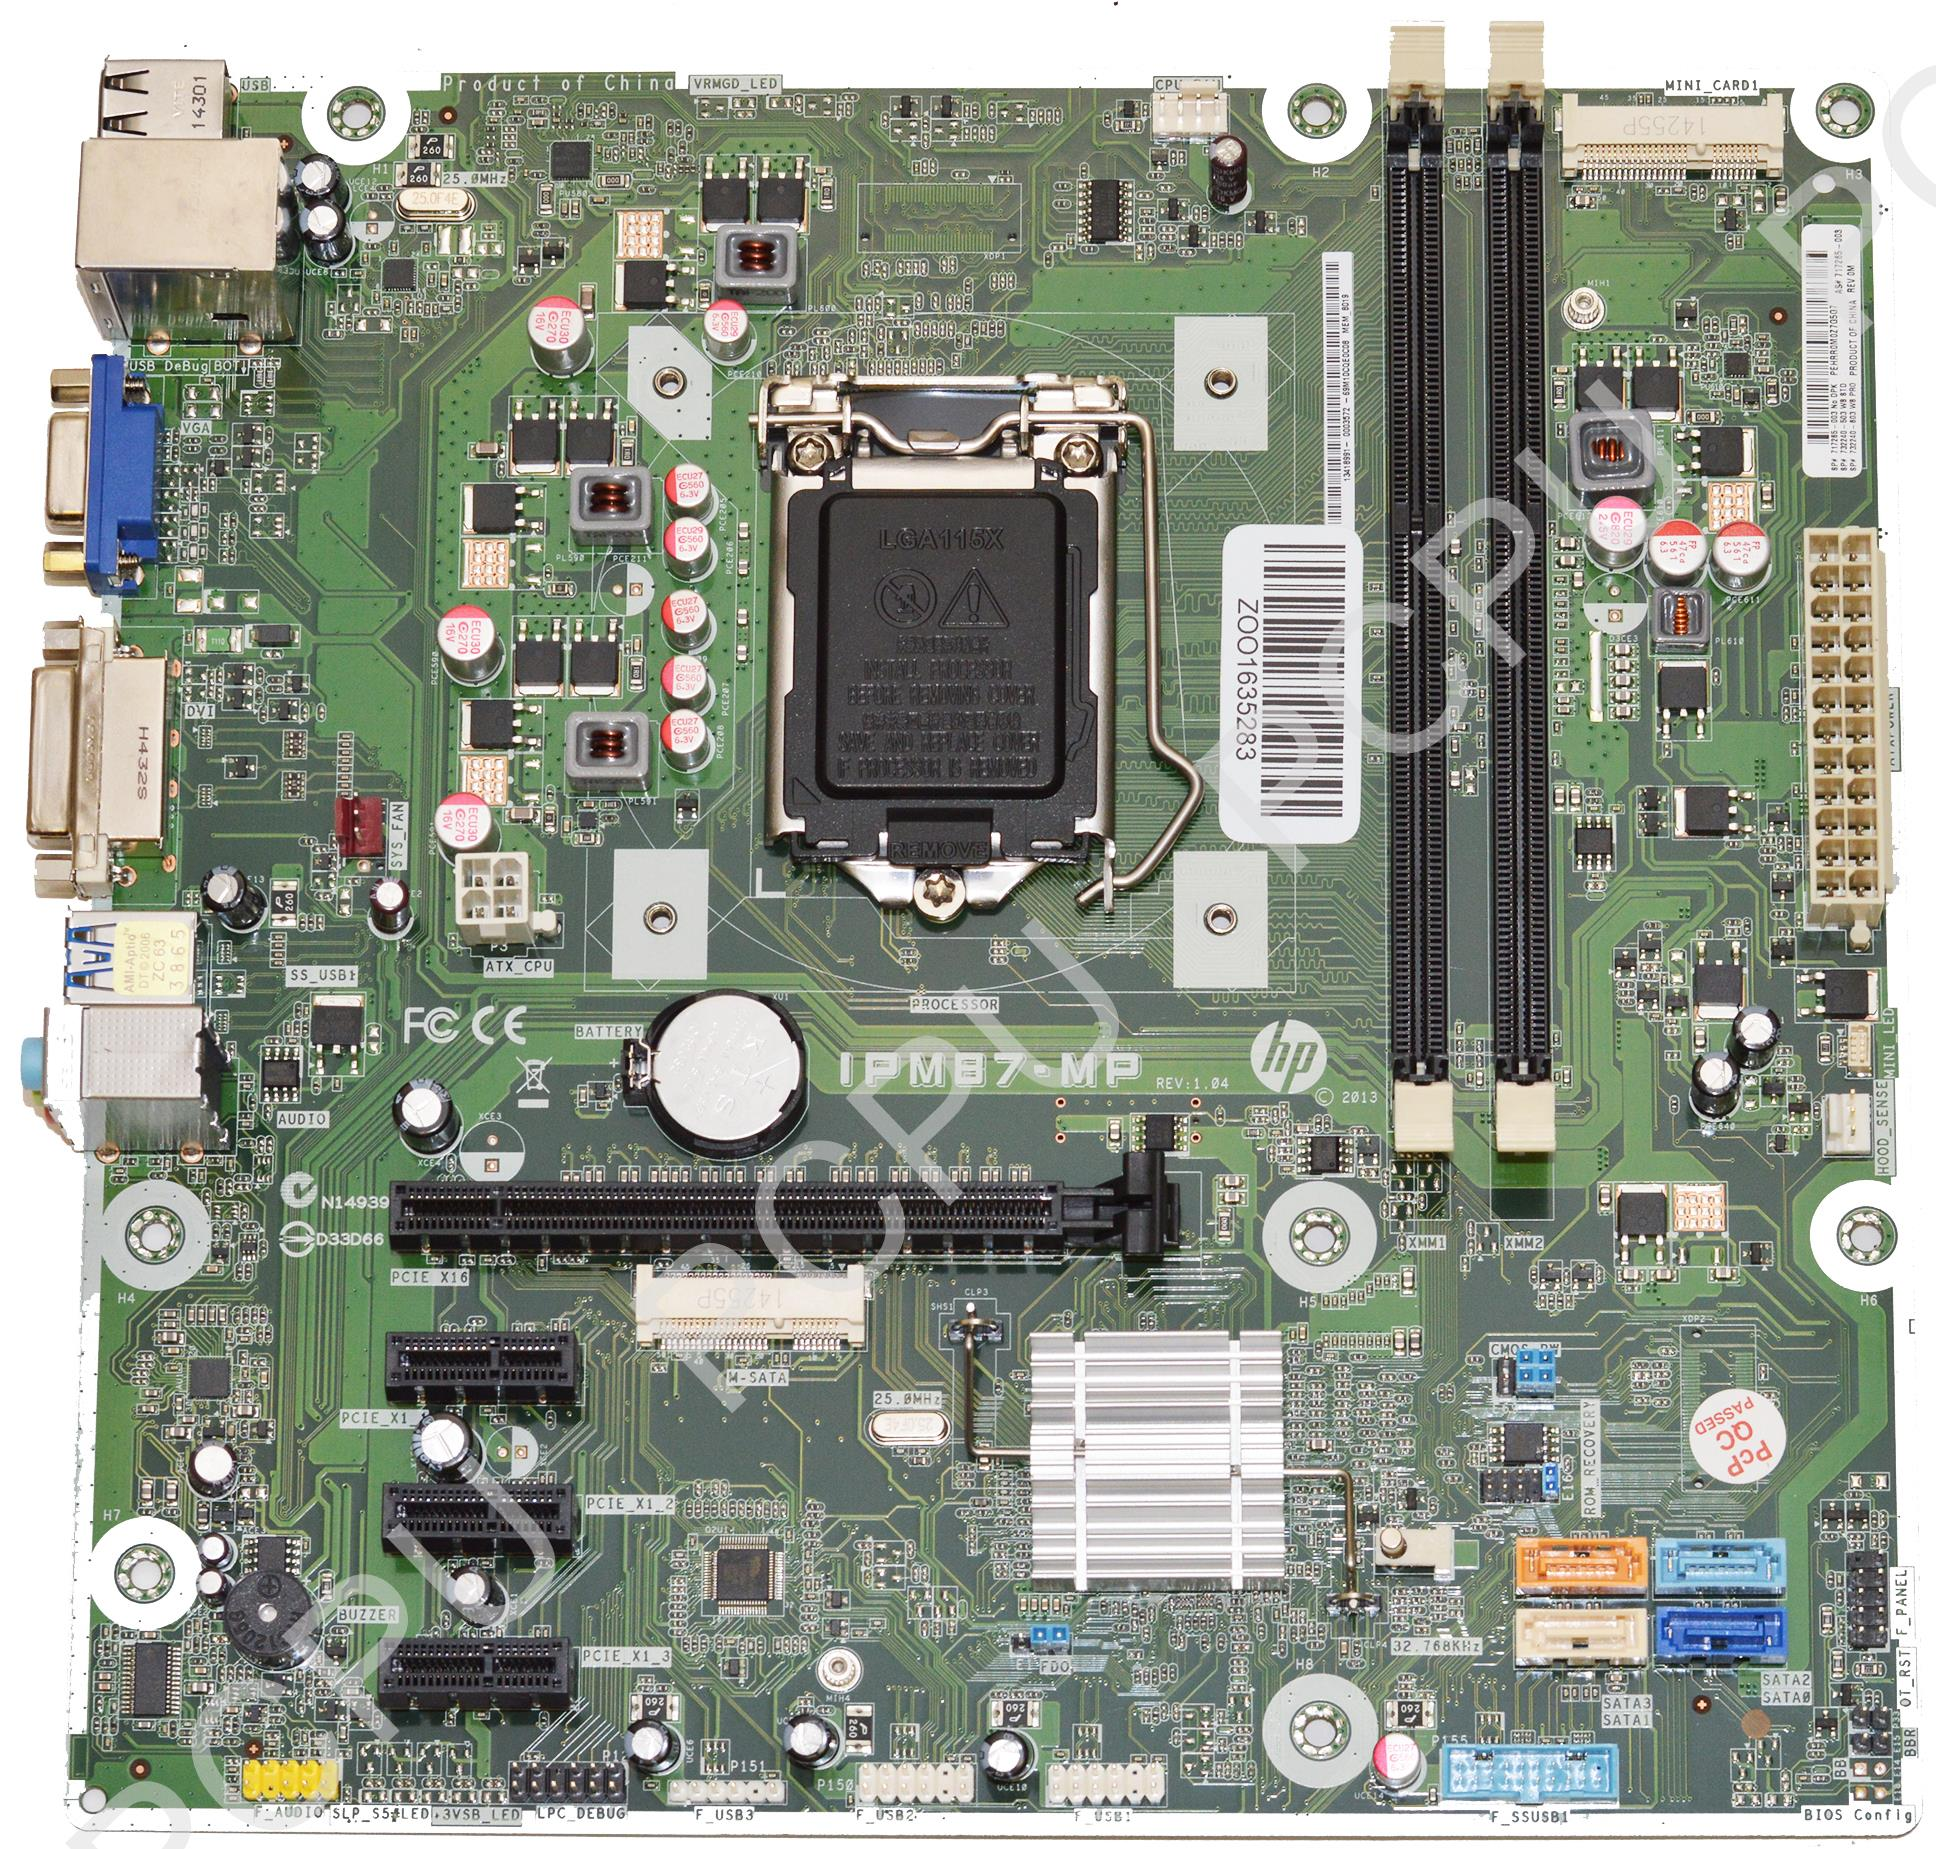 732240-503 HP Envy 700 Memphis-B Intel Desktop Motherboar...